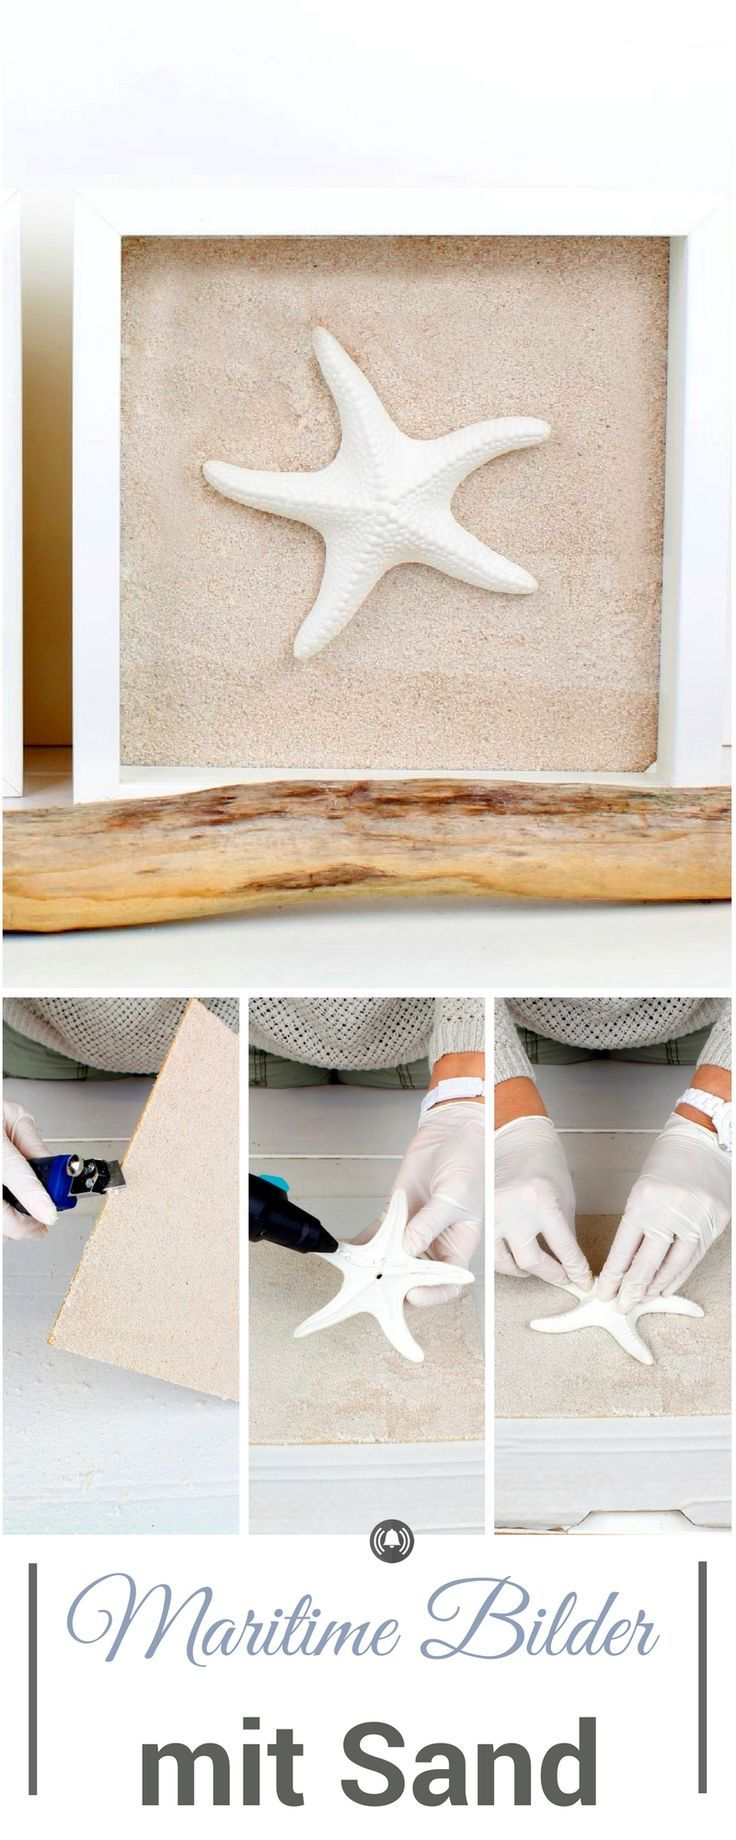 Ikea-Hack: Maritime Bilder mit Sand mit dem Ribba Bilderrahmen